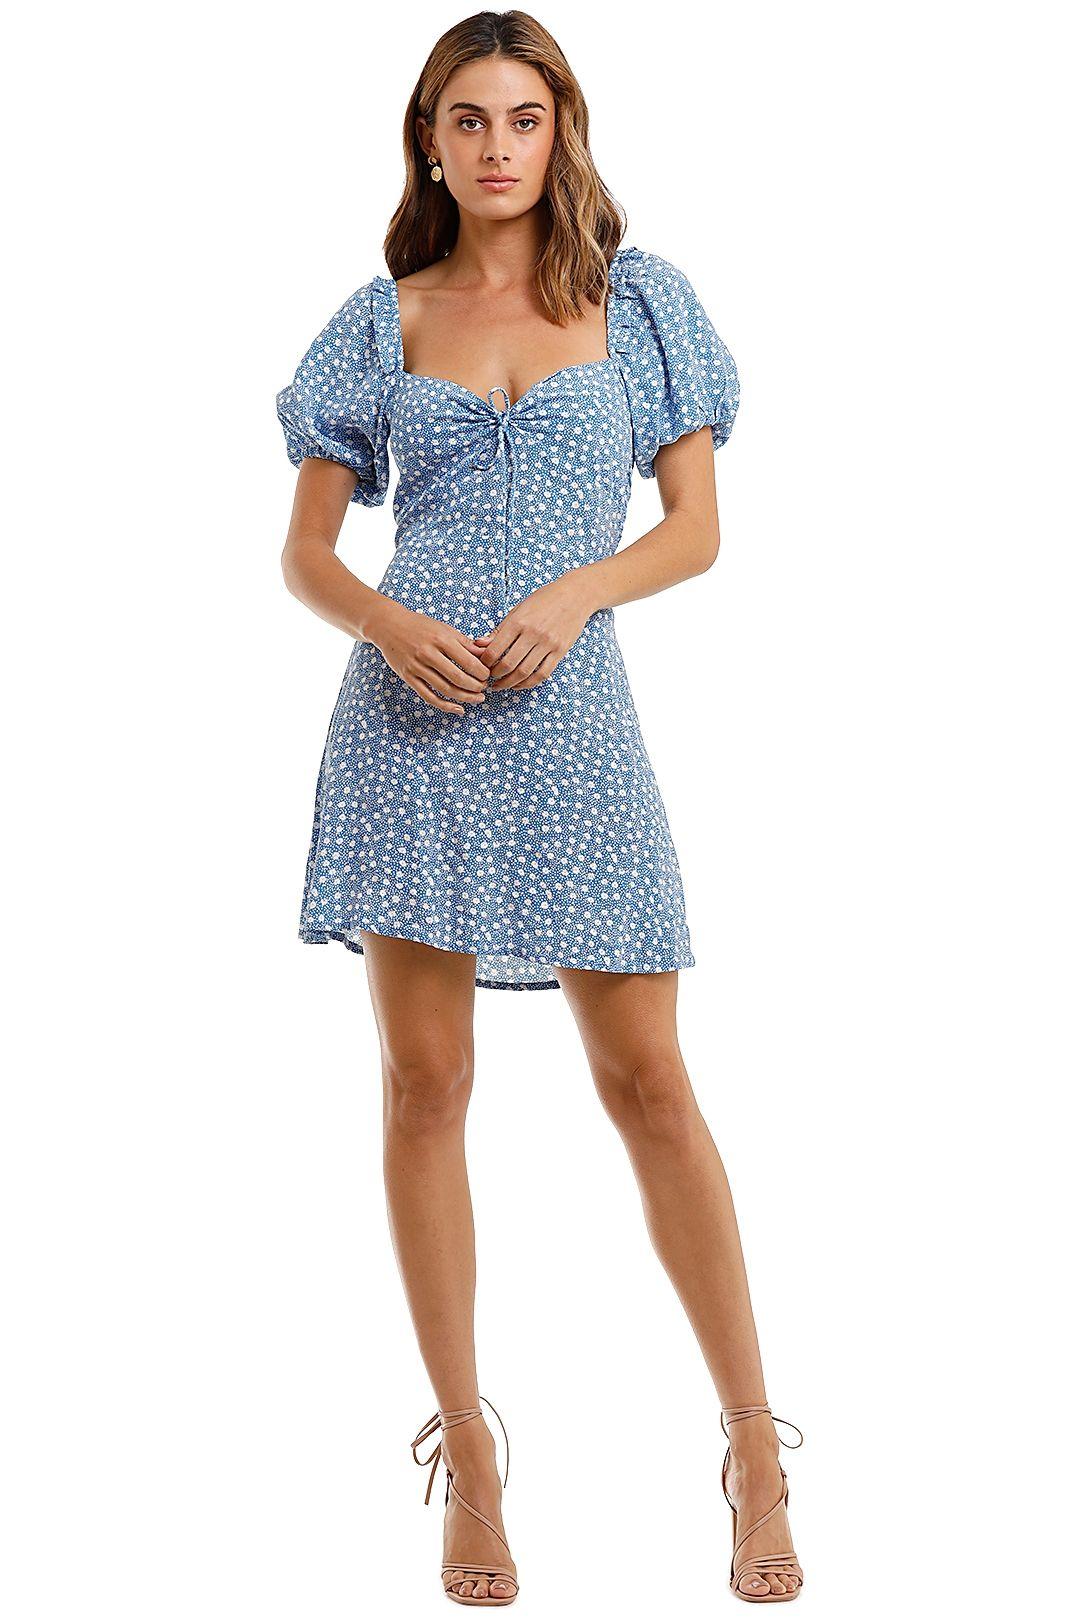 Faithfull Shimma Mini Dress